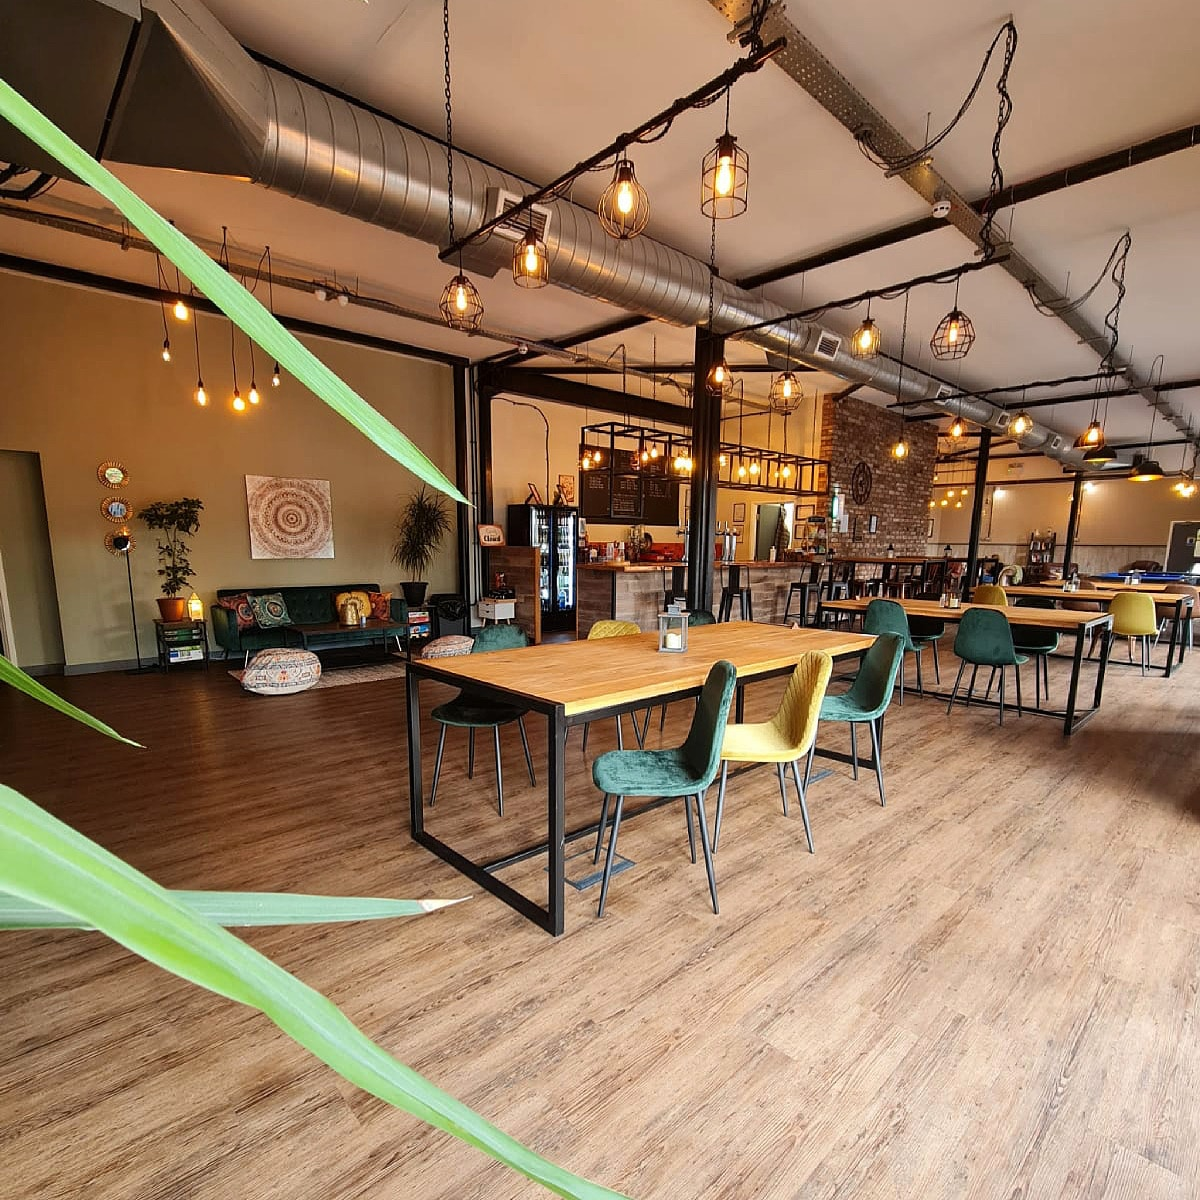 The Studios Bar